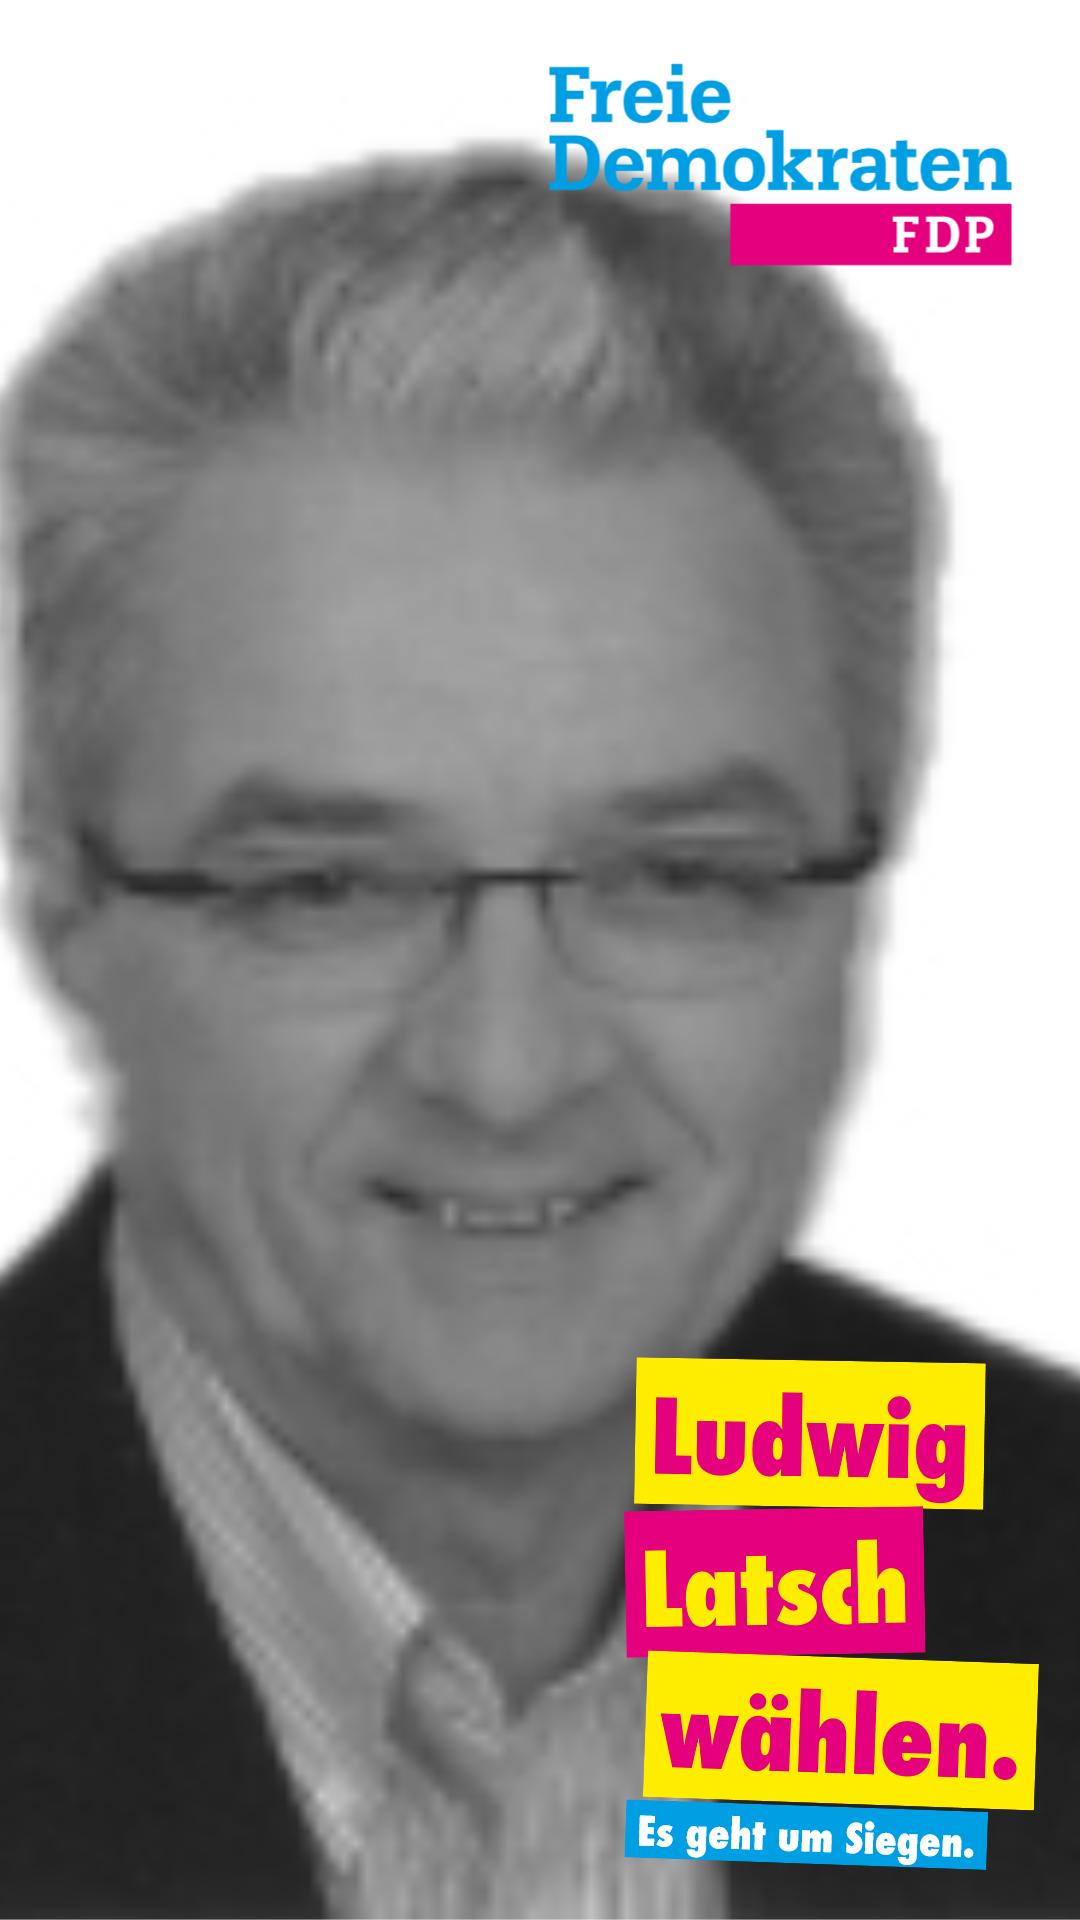 Ludwig Latsch